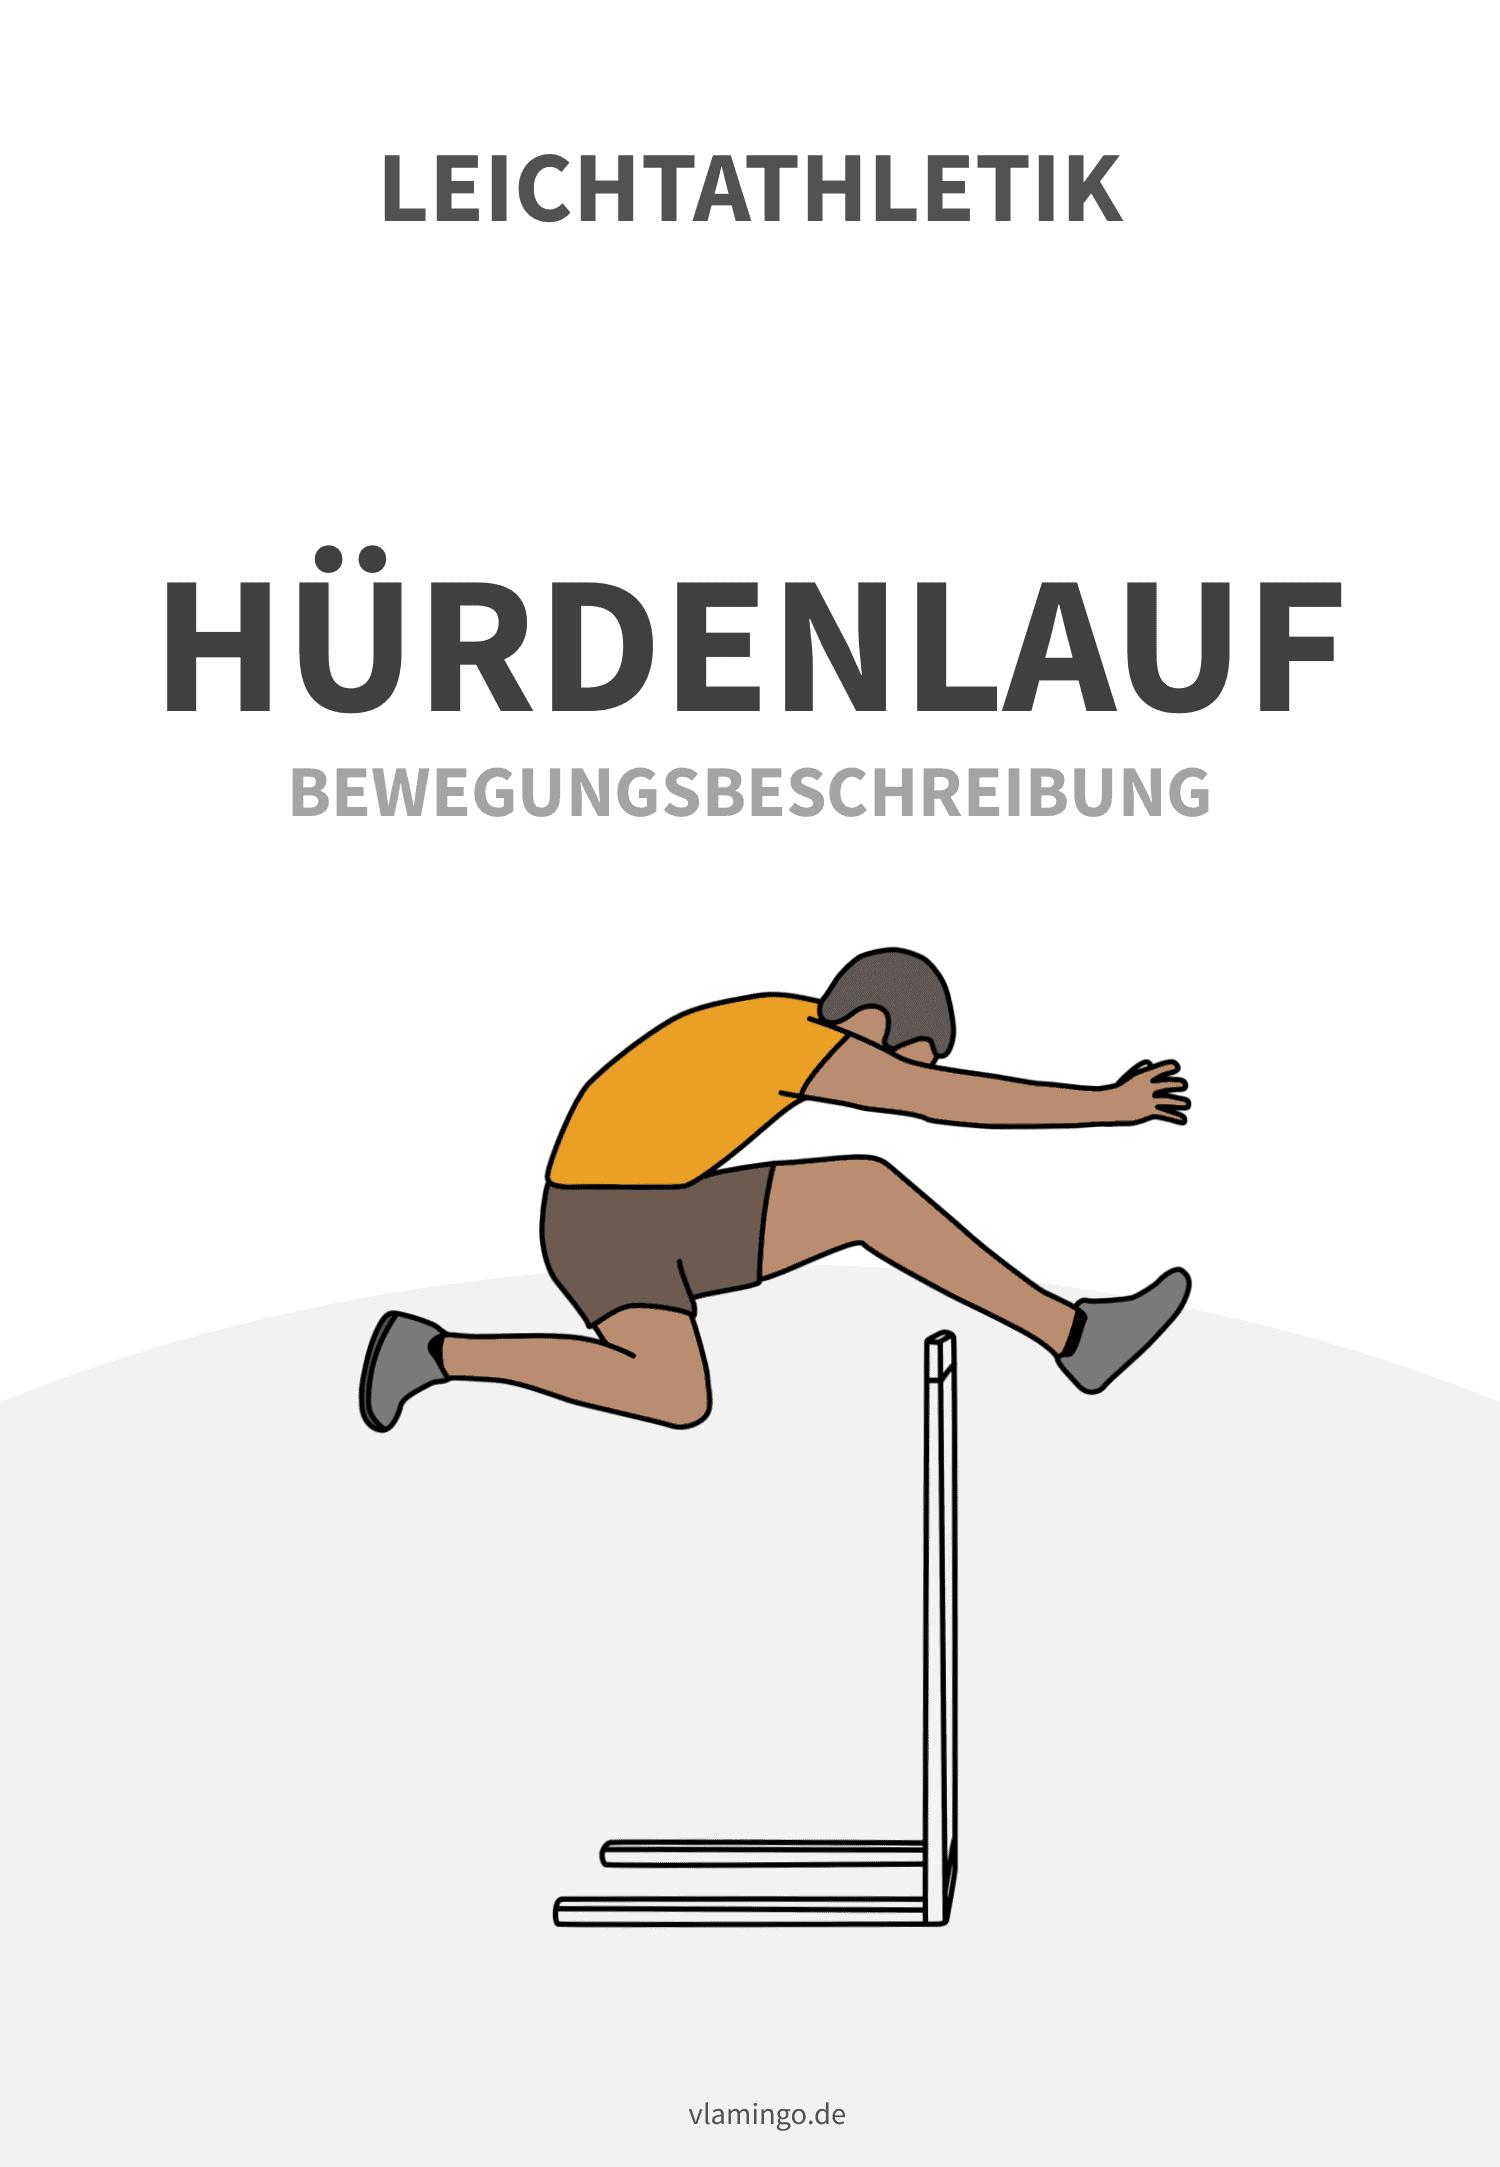 Leichtathletik - Hürdenlauf